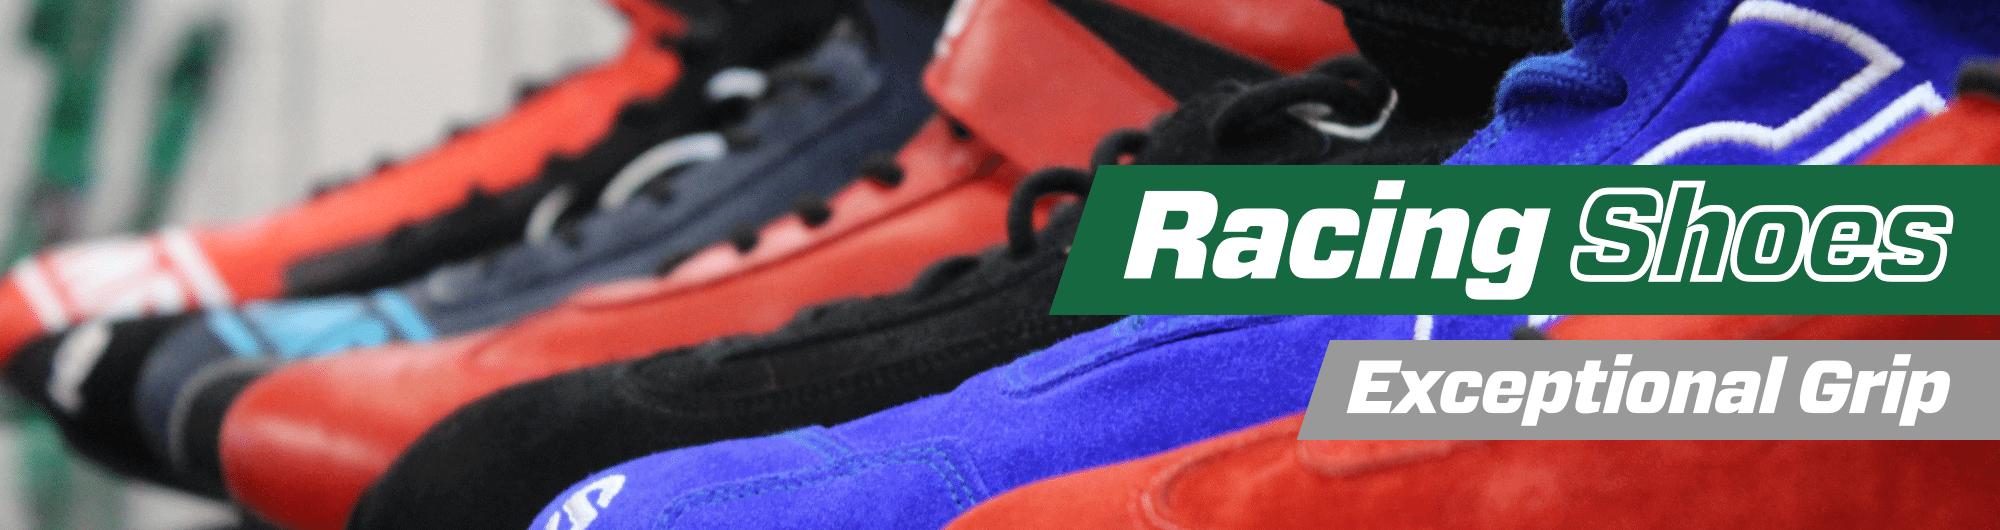 Racing Shoes – Exceptional Grip – www.gsmotorsport.co.uk Hero Image – October 2017